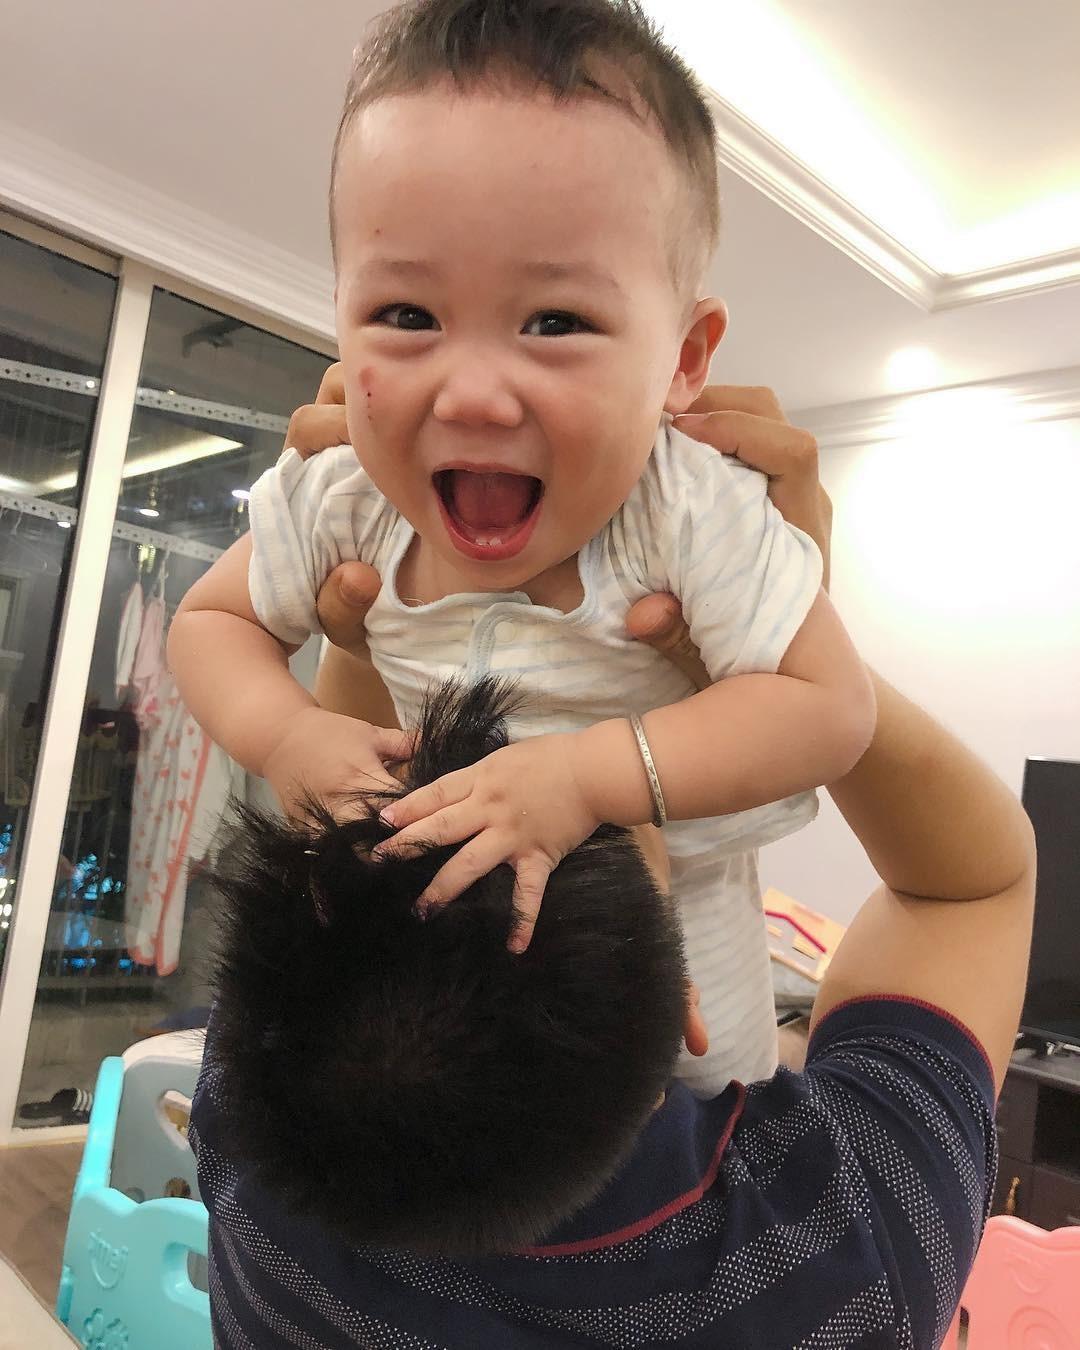 Hot girl,Hot mom,Nuôi dạy con,Elly Trần,Huyền Baby